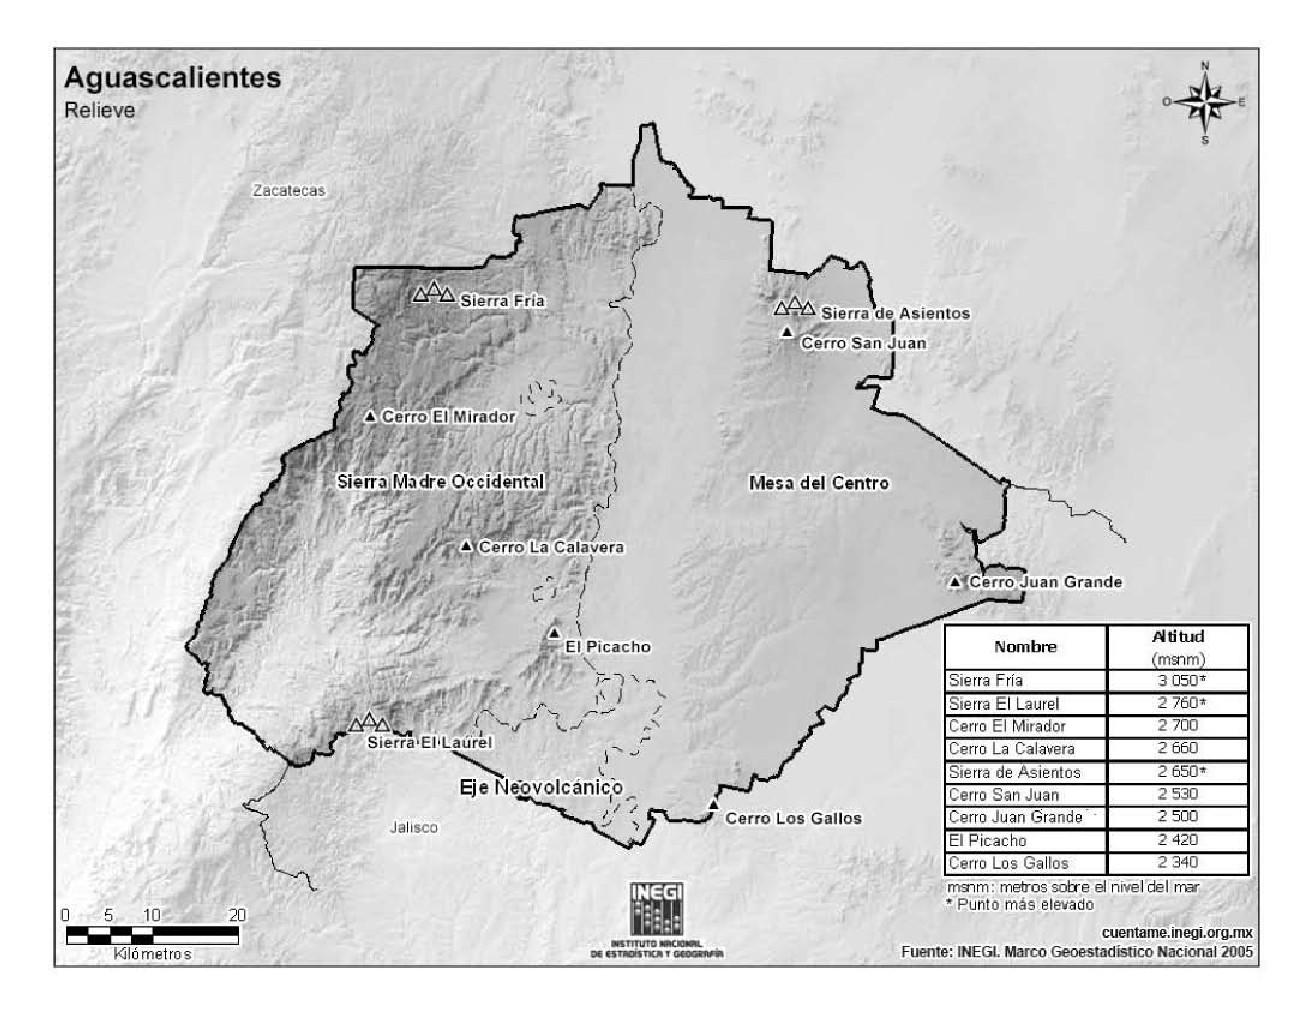 Mapa de montañas de Aguascalientes. INEGI de México